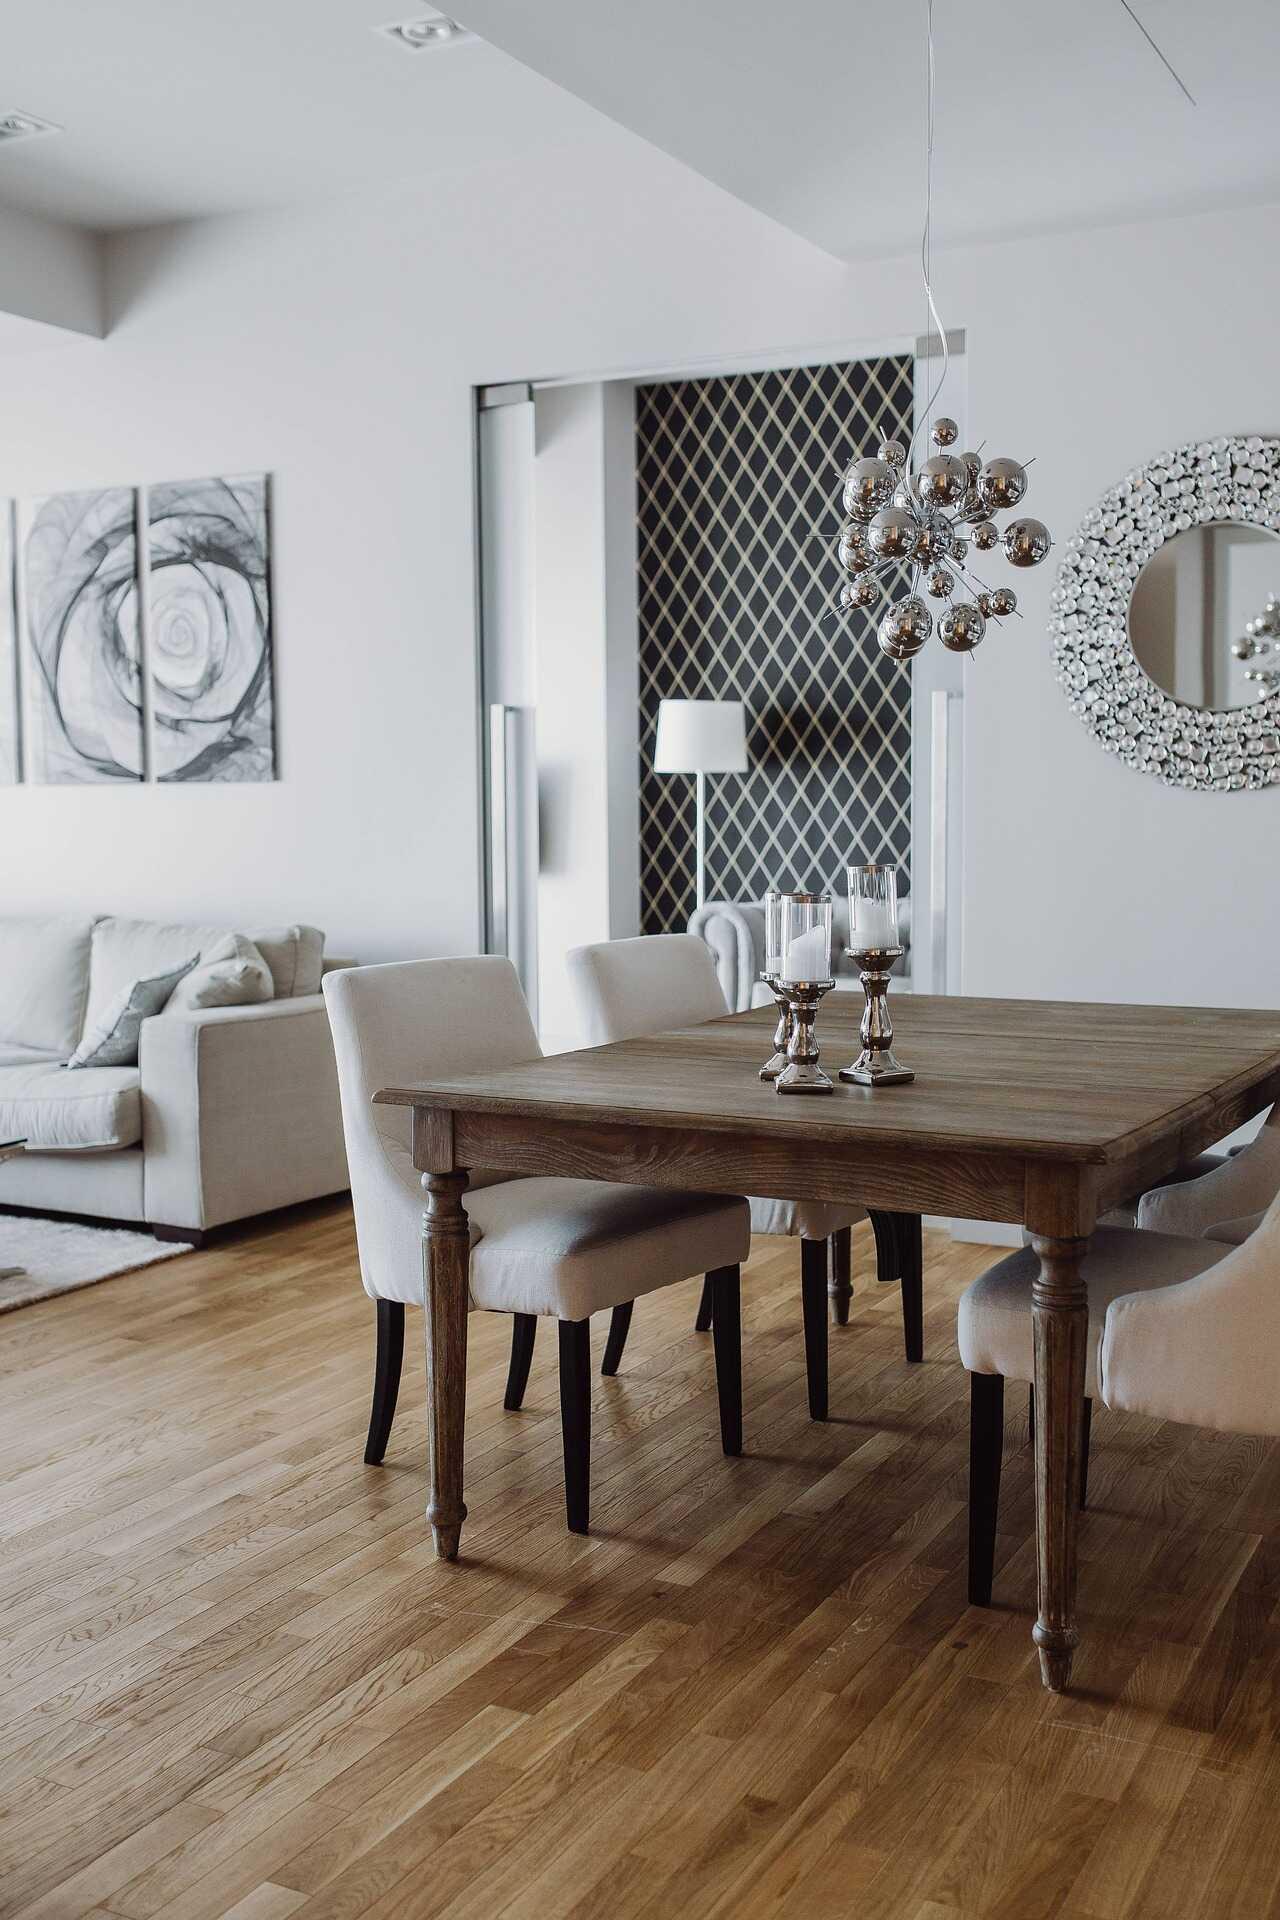 Kredyt hipoteczny Grójec - kredyt na zakup mieszkania, kredyt na budowę domu Grójec